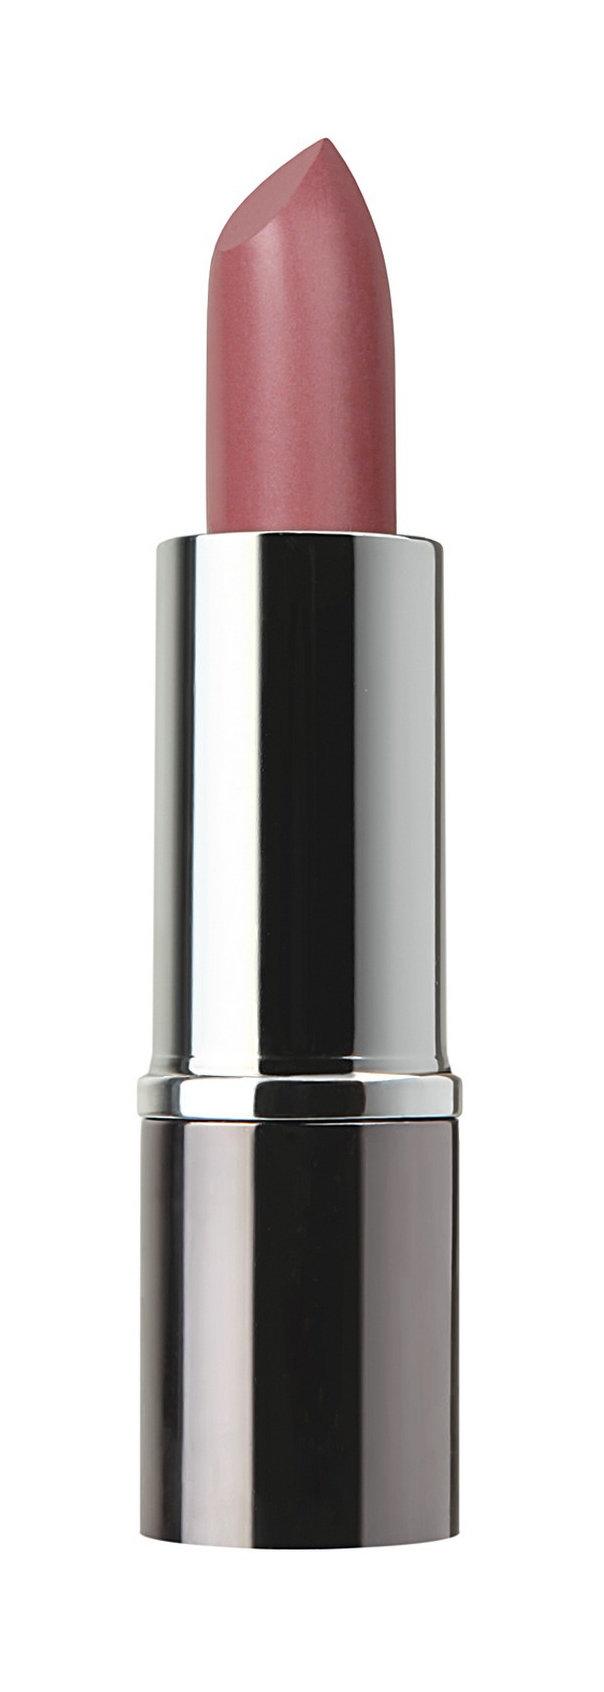 Limoni Помада Lip Stick Губная Увлажняющая тон 221, 4,5 мл цены онлайн